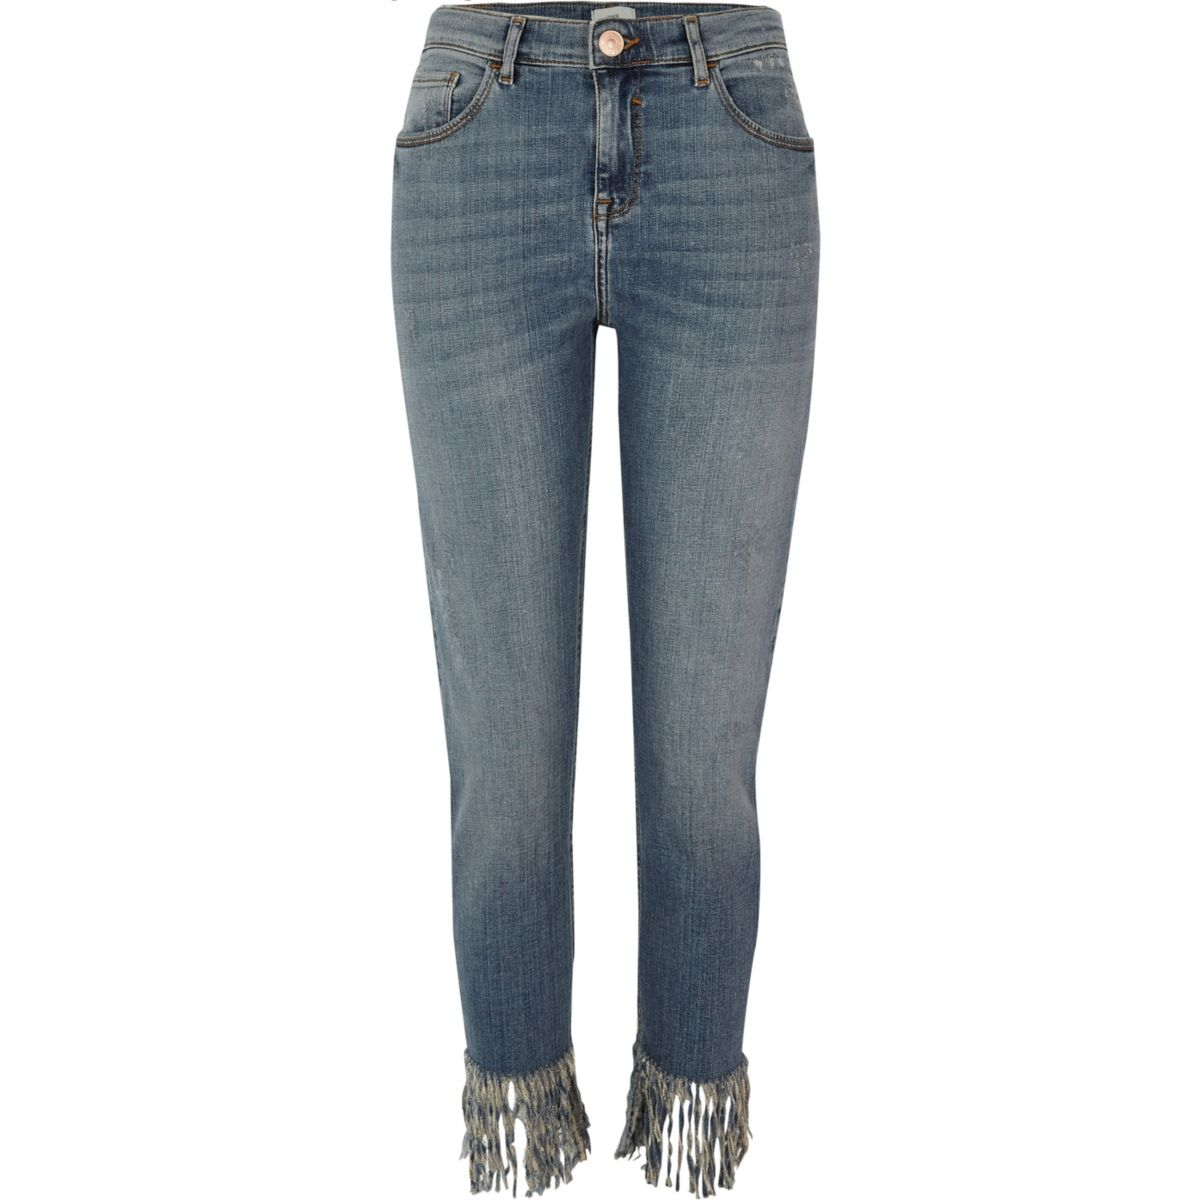 Alannah – Blaue Skinny Jeans mit Fransensaum